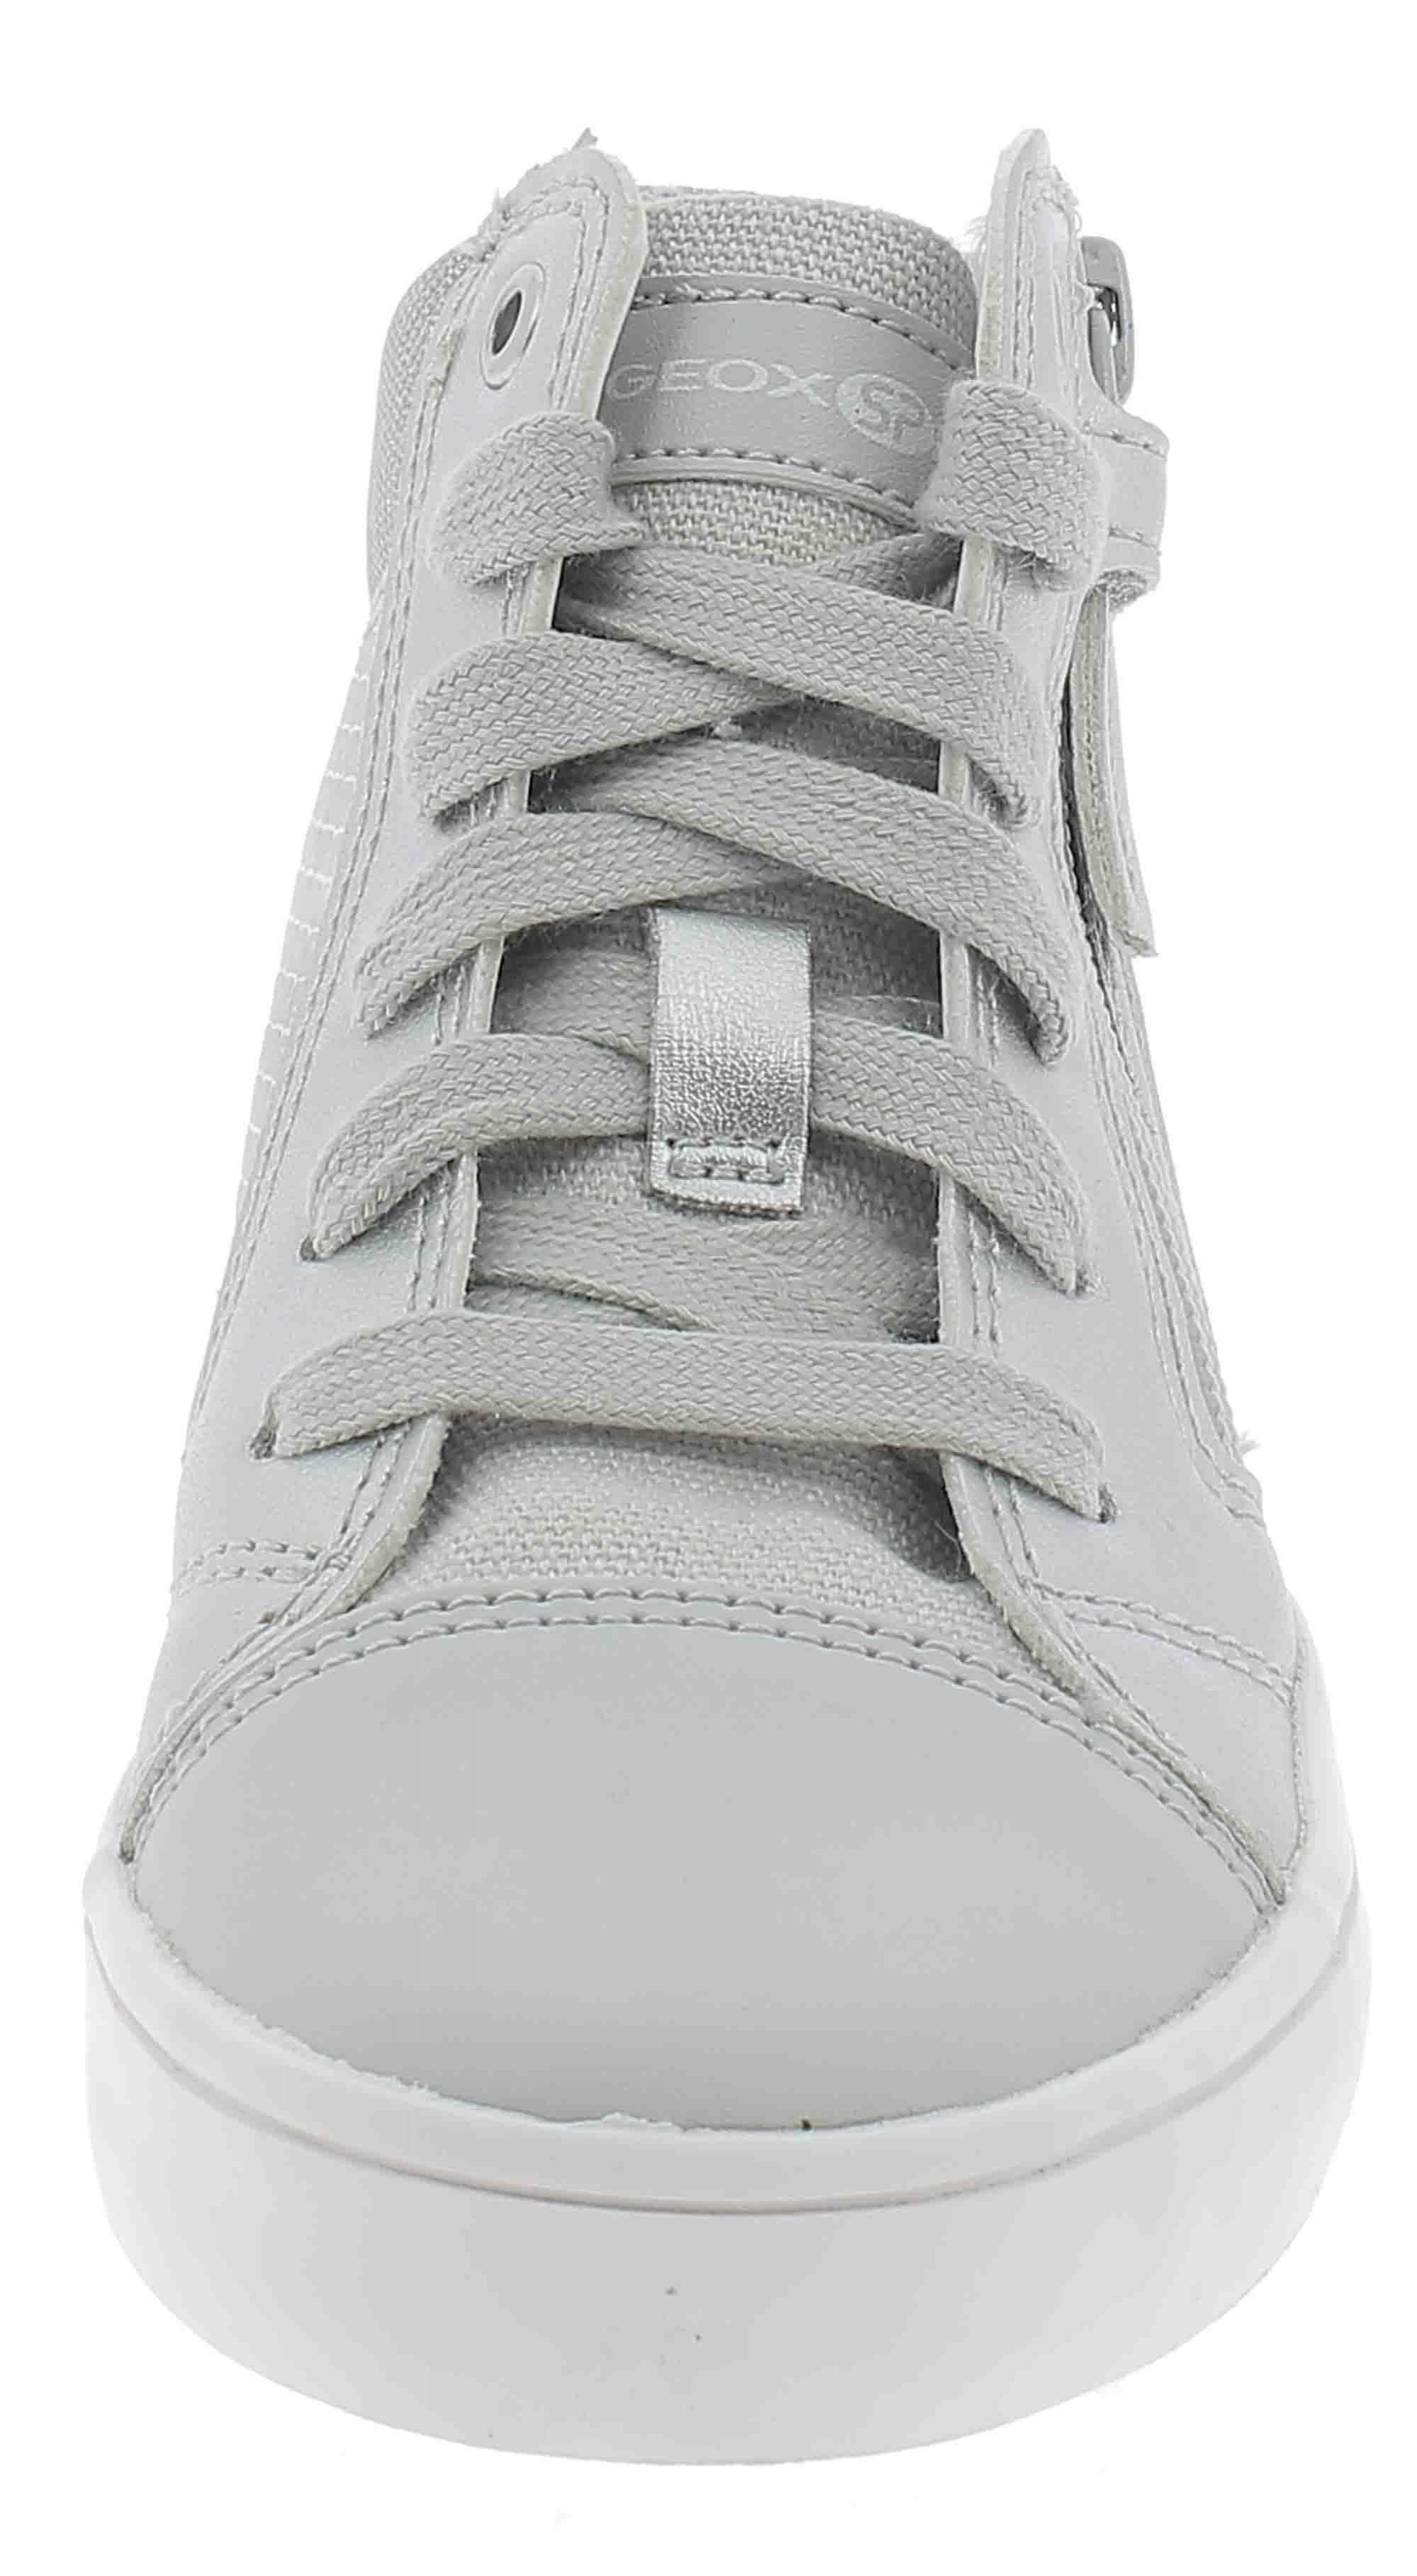 geox j gisli scarpe sportive bambina argento j924nec0434